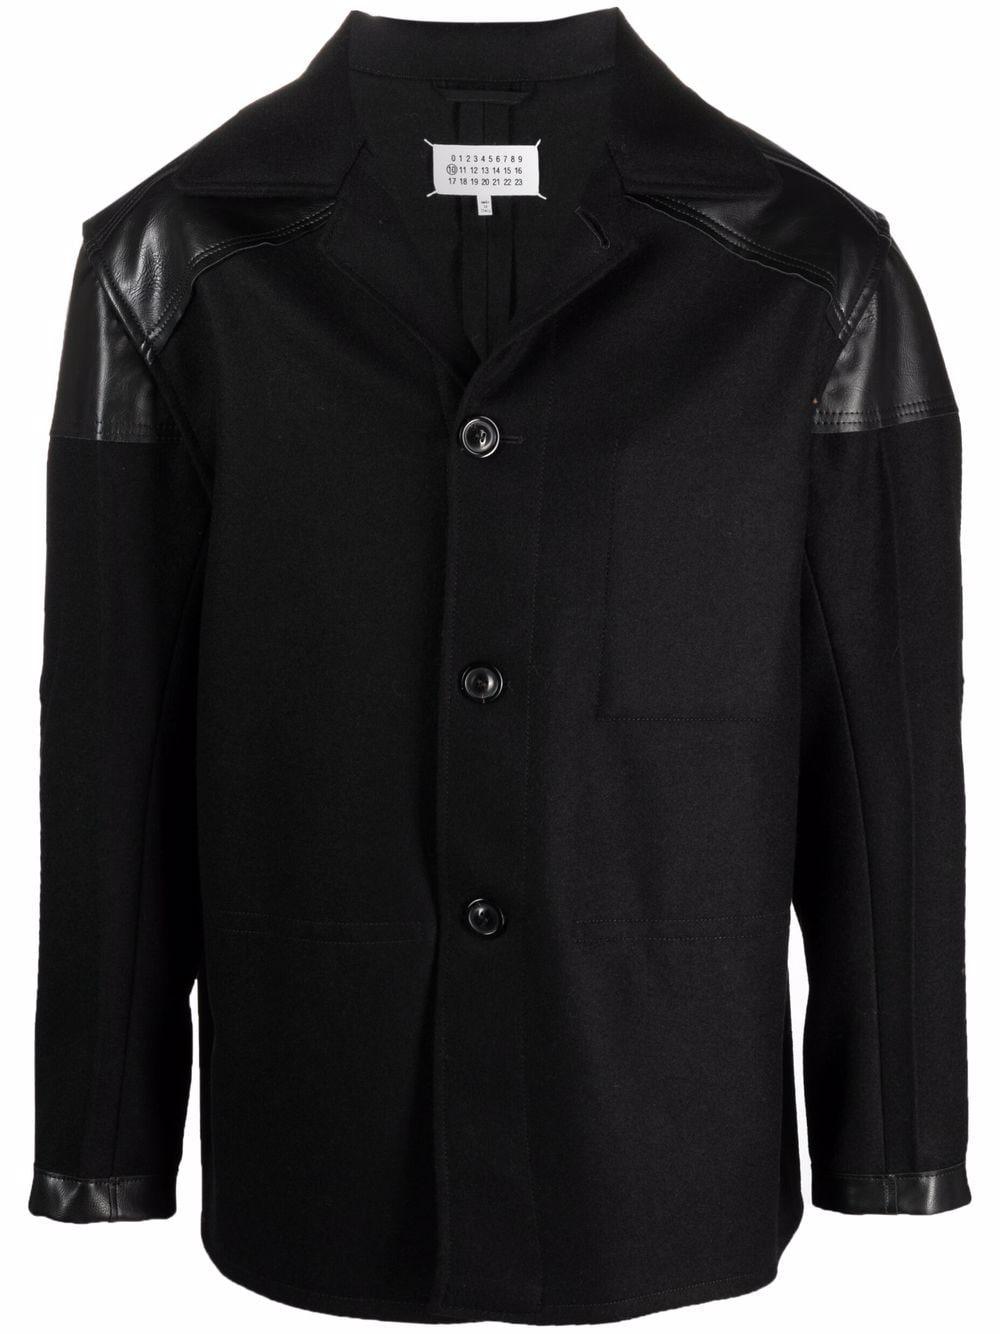 wool jacket man black MAISON MARGIELA | Jackets | S50AM0520 S44024900